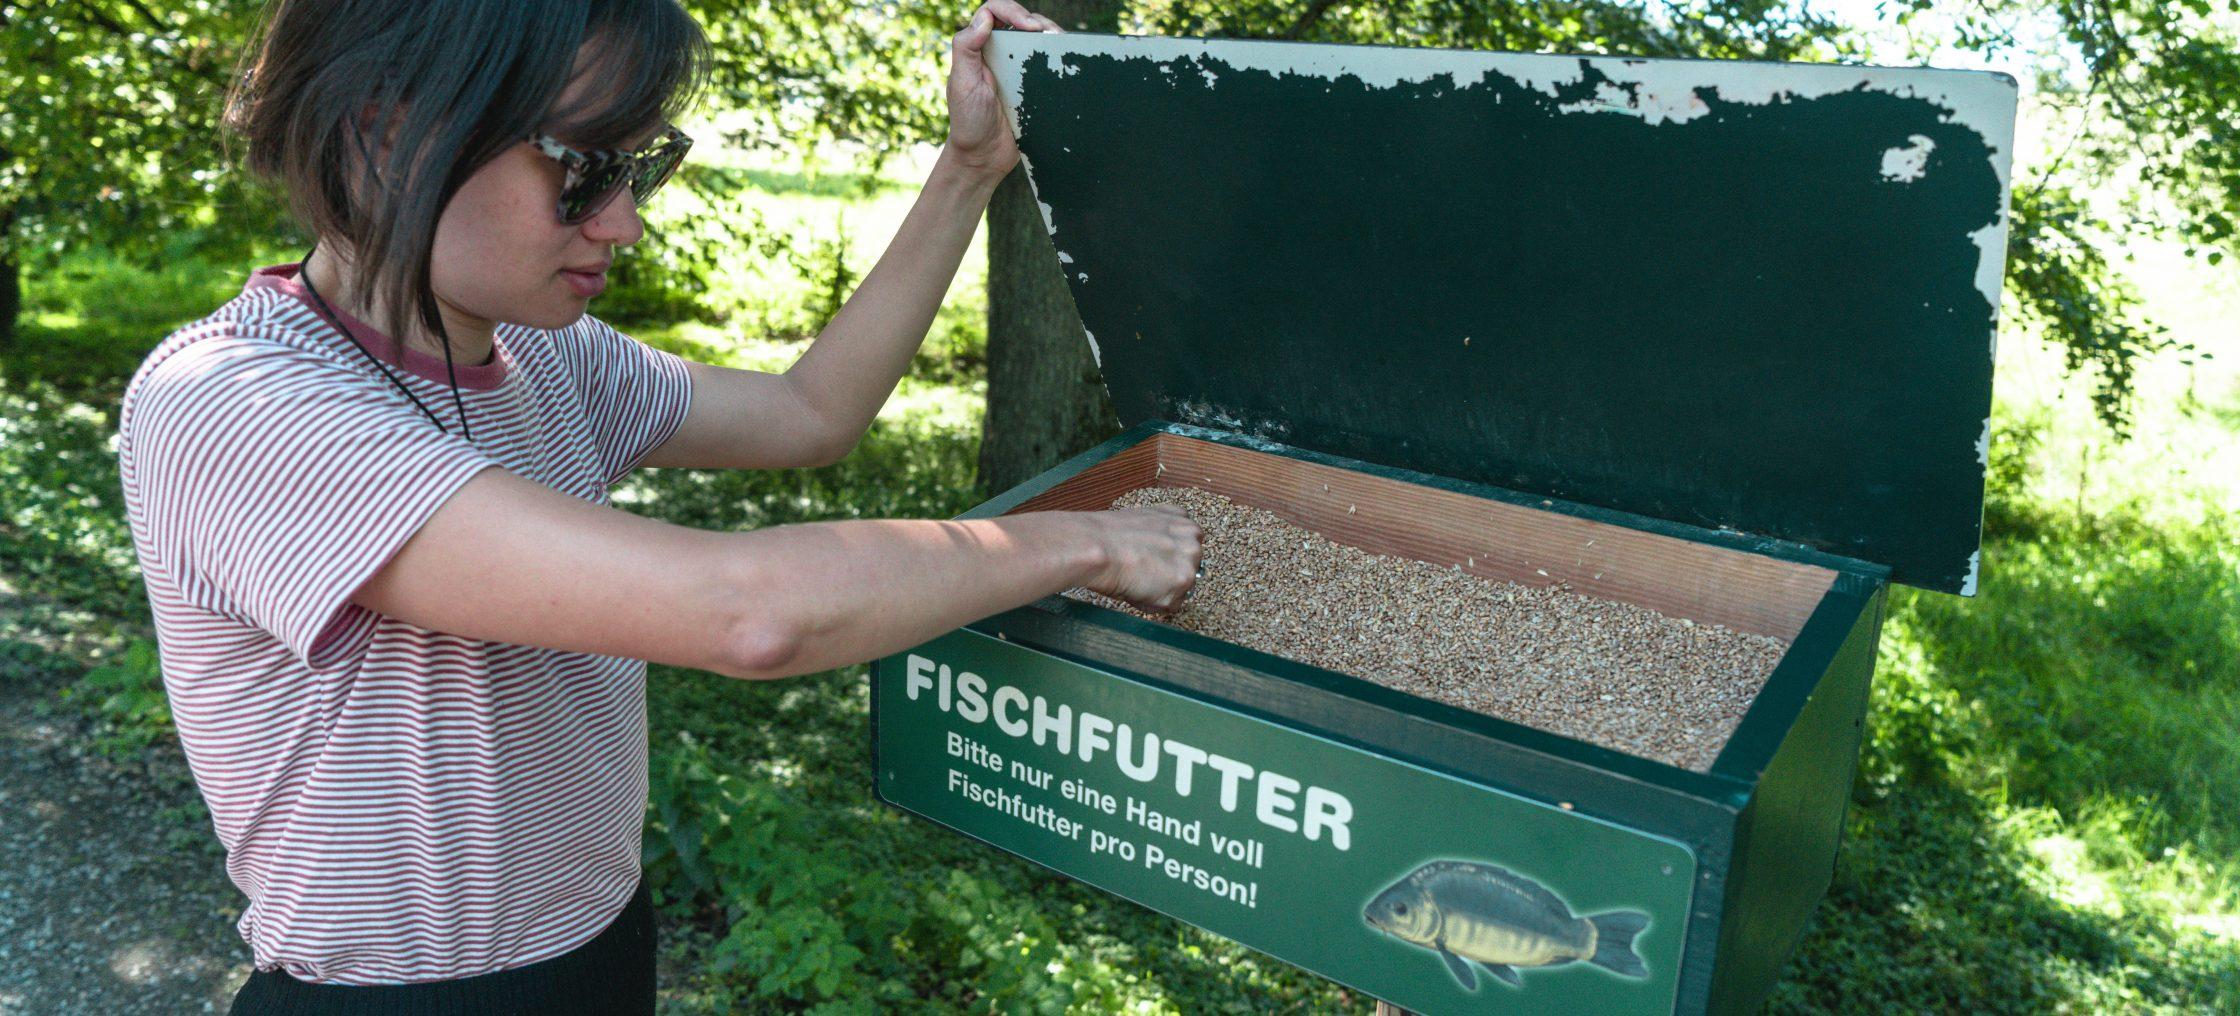 Bodensee Affenberg Frau am Fischfutter herausnehmen